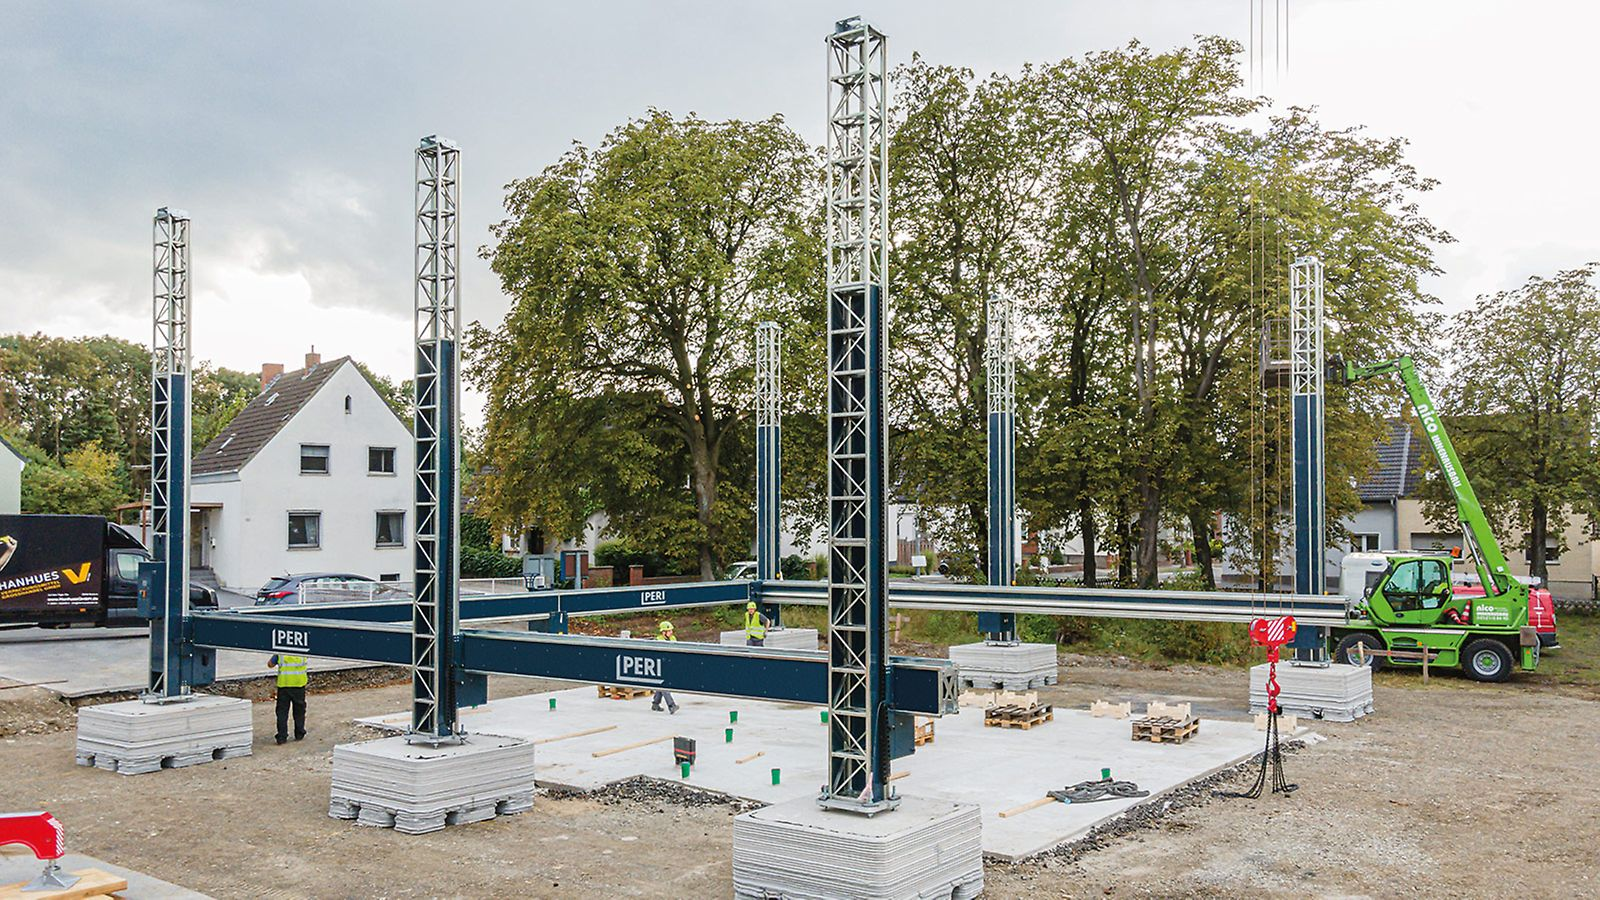 Baustelle PERI GmbH in NRW